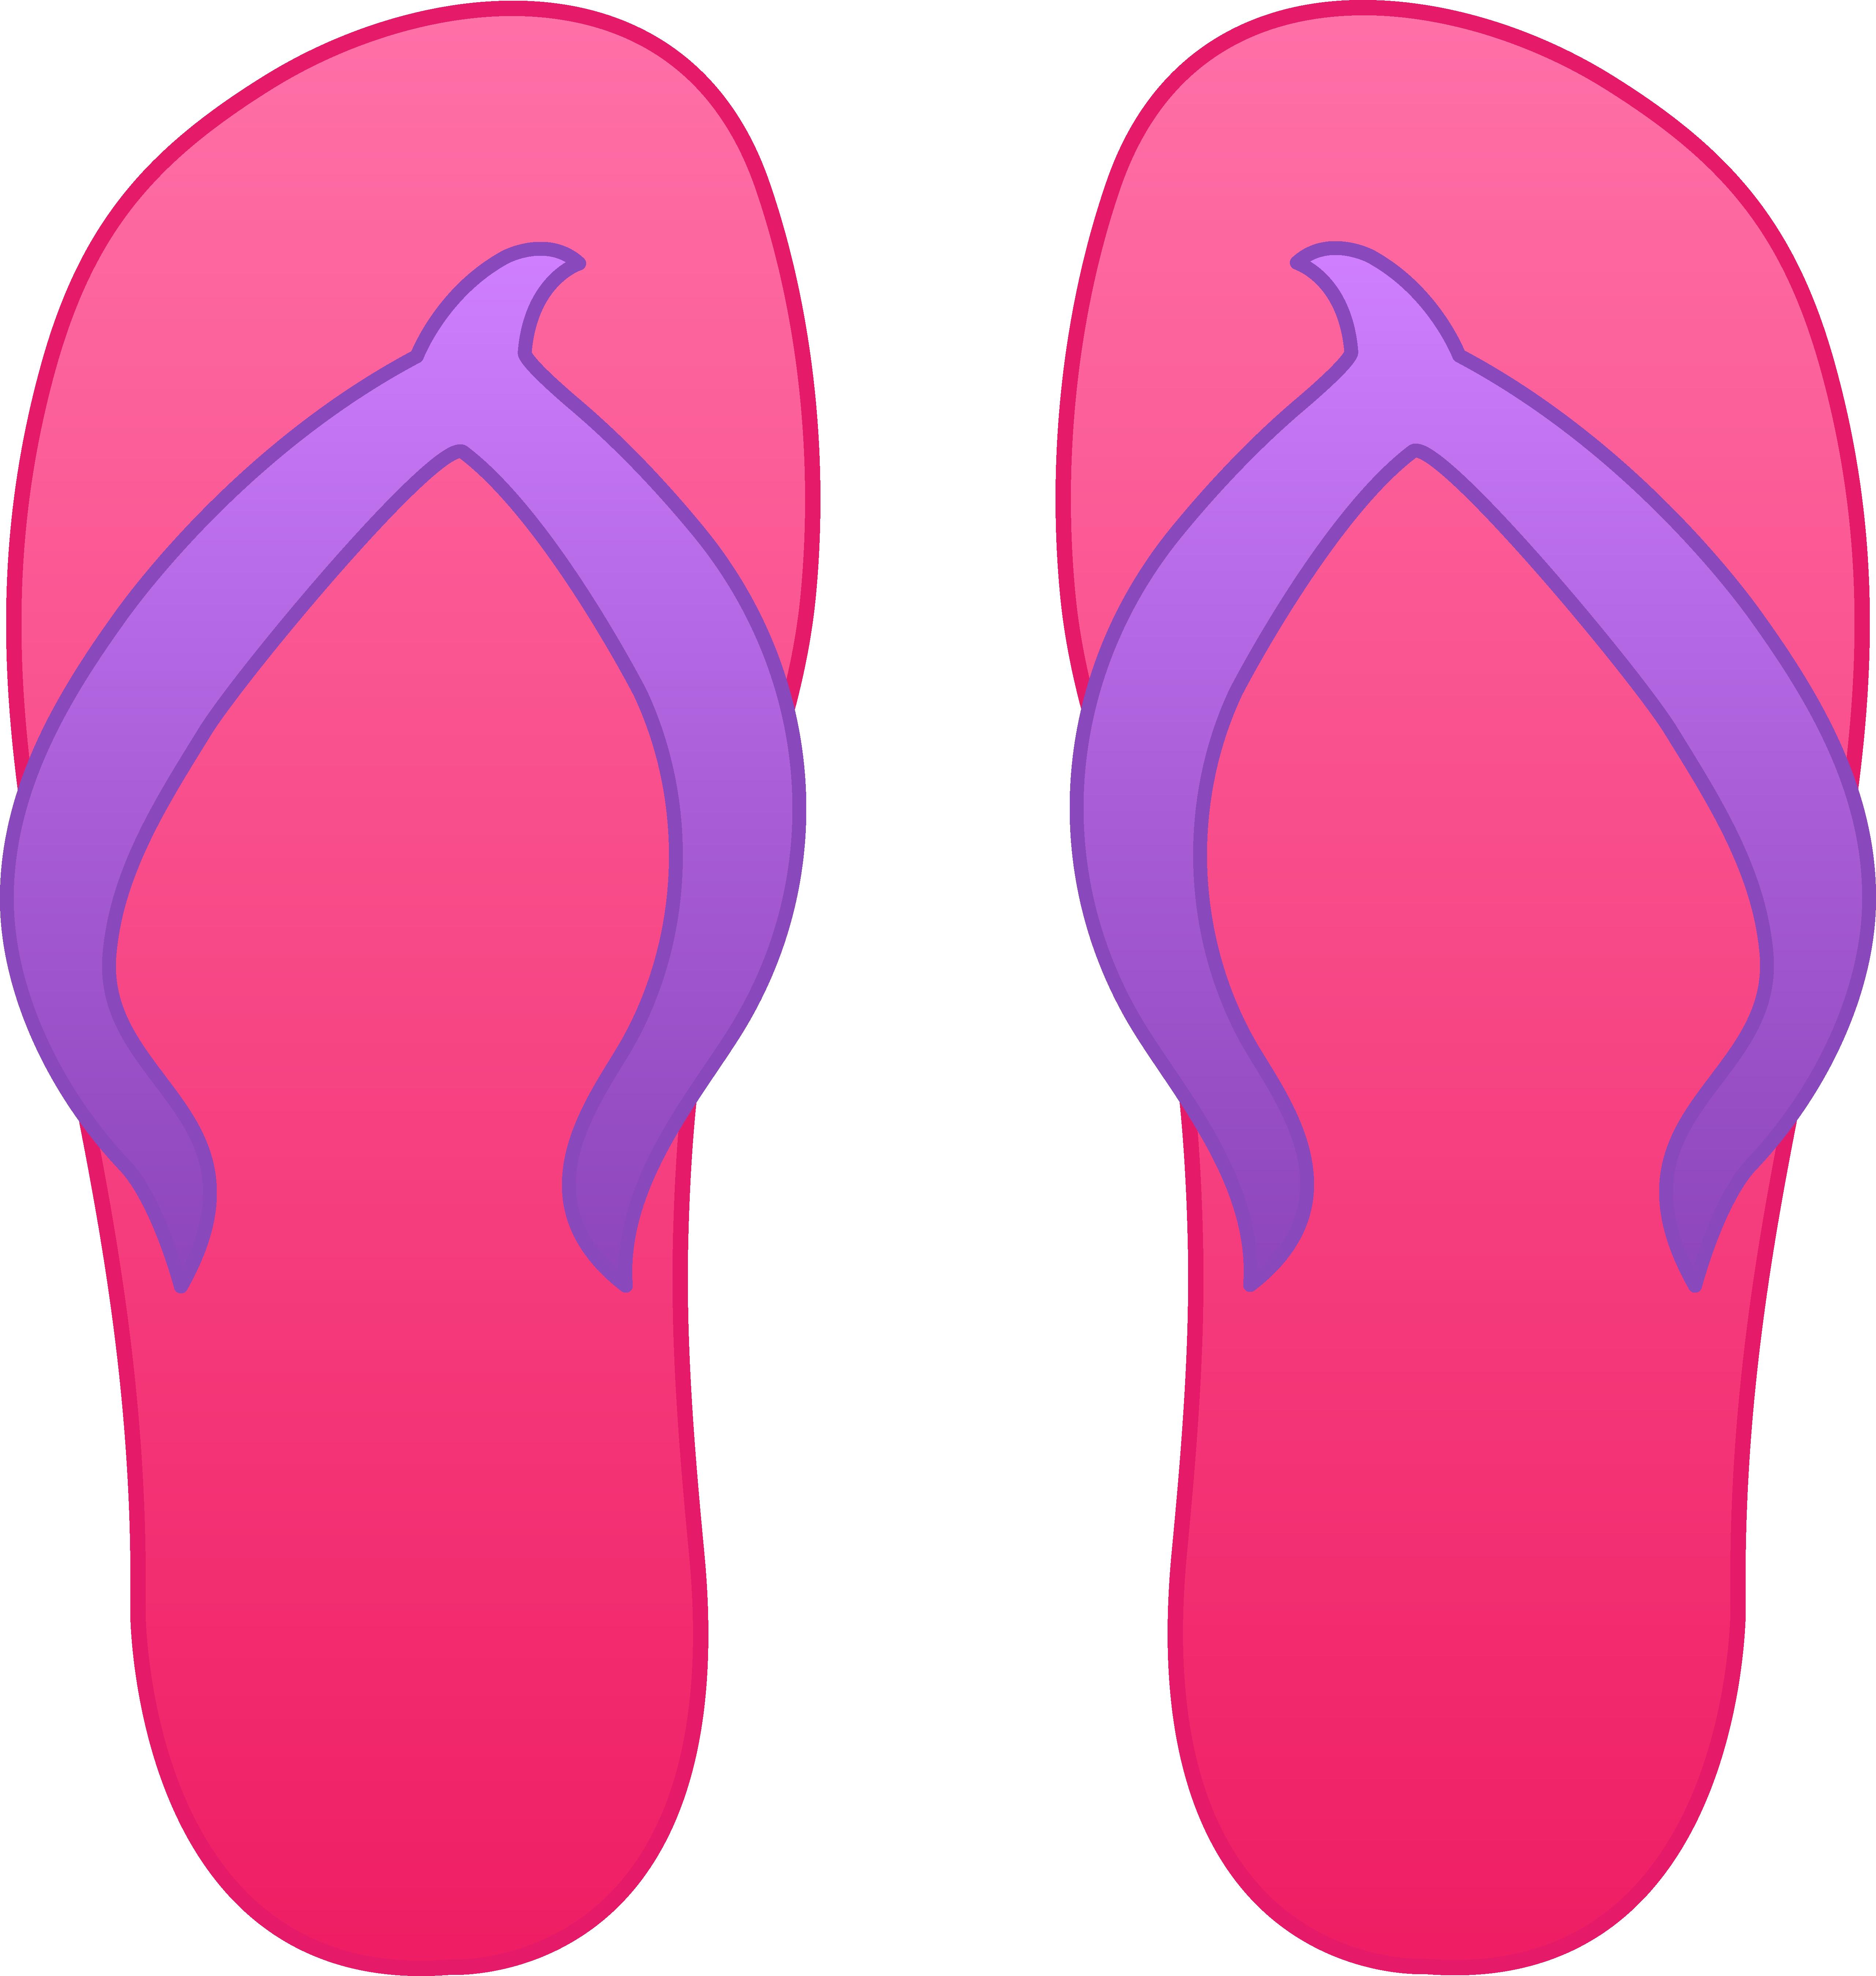 Flip Flop Pink Sandals clipart free image.